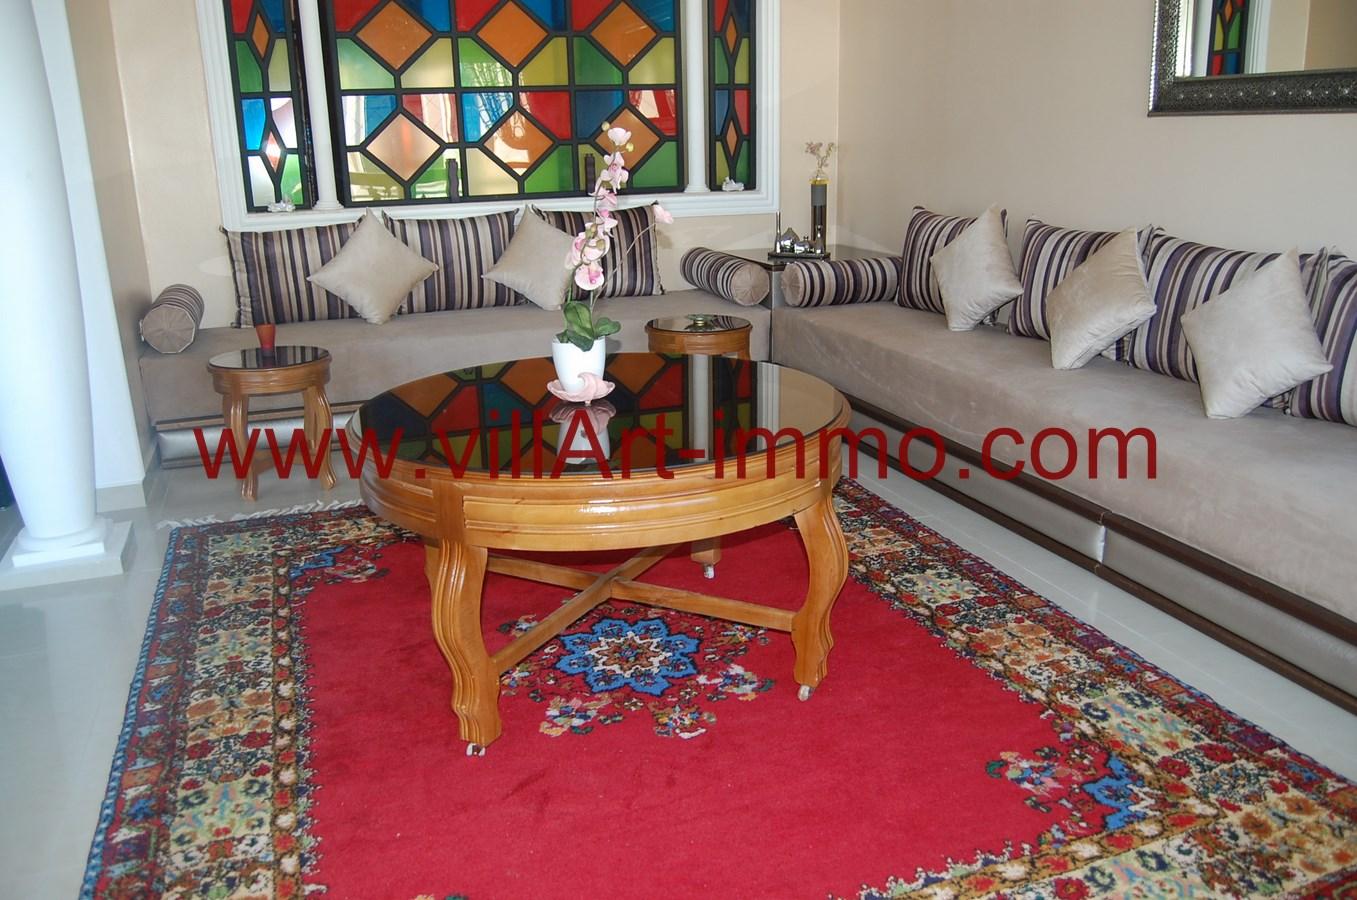 3-location-appartement-meuble-iberia-tanger-double-salon-l895-villart-immo